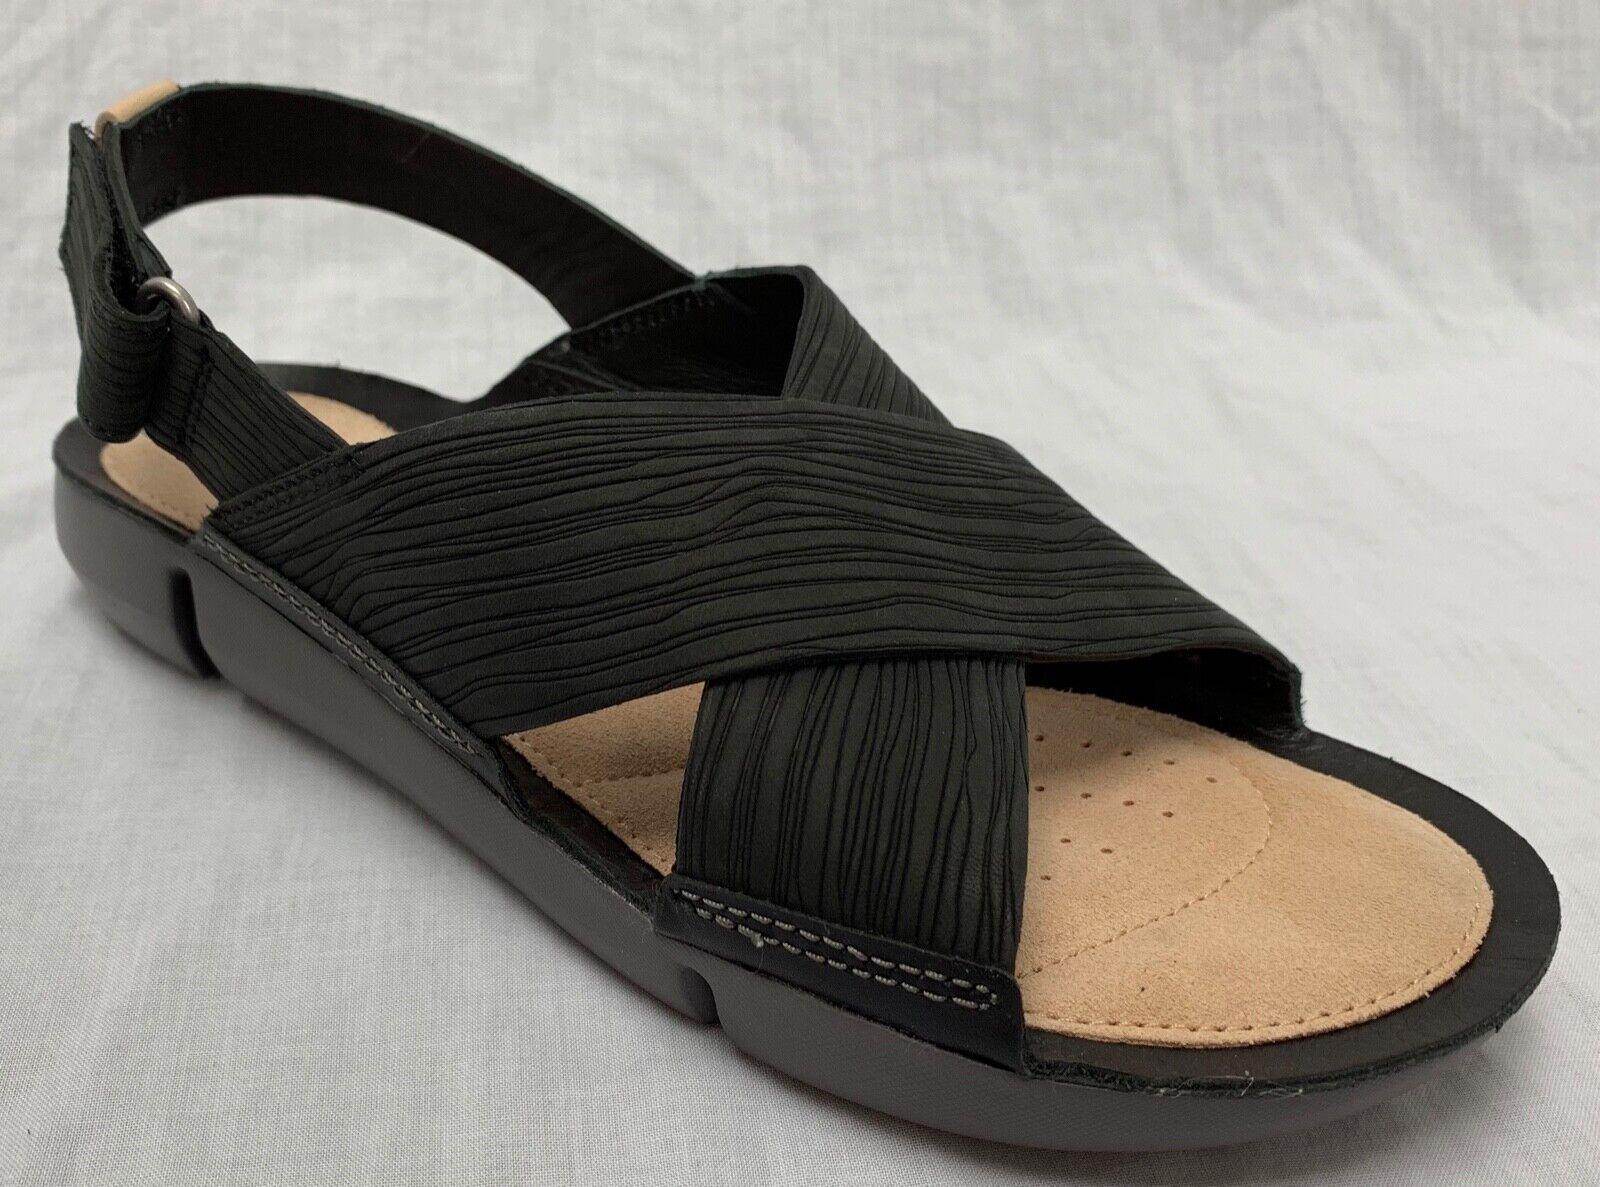 4a728c7a BNIB Clarks Ladies Tri Chloe Trigenic Black Nubuck Leather Flat Sandals